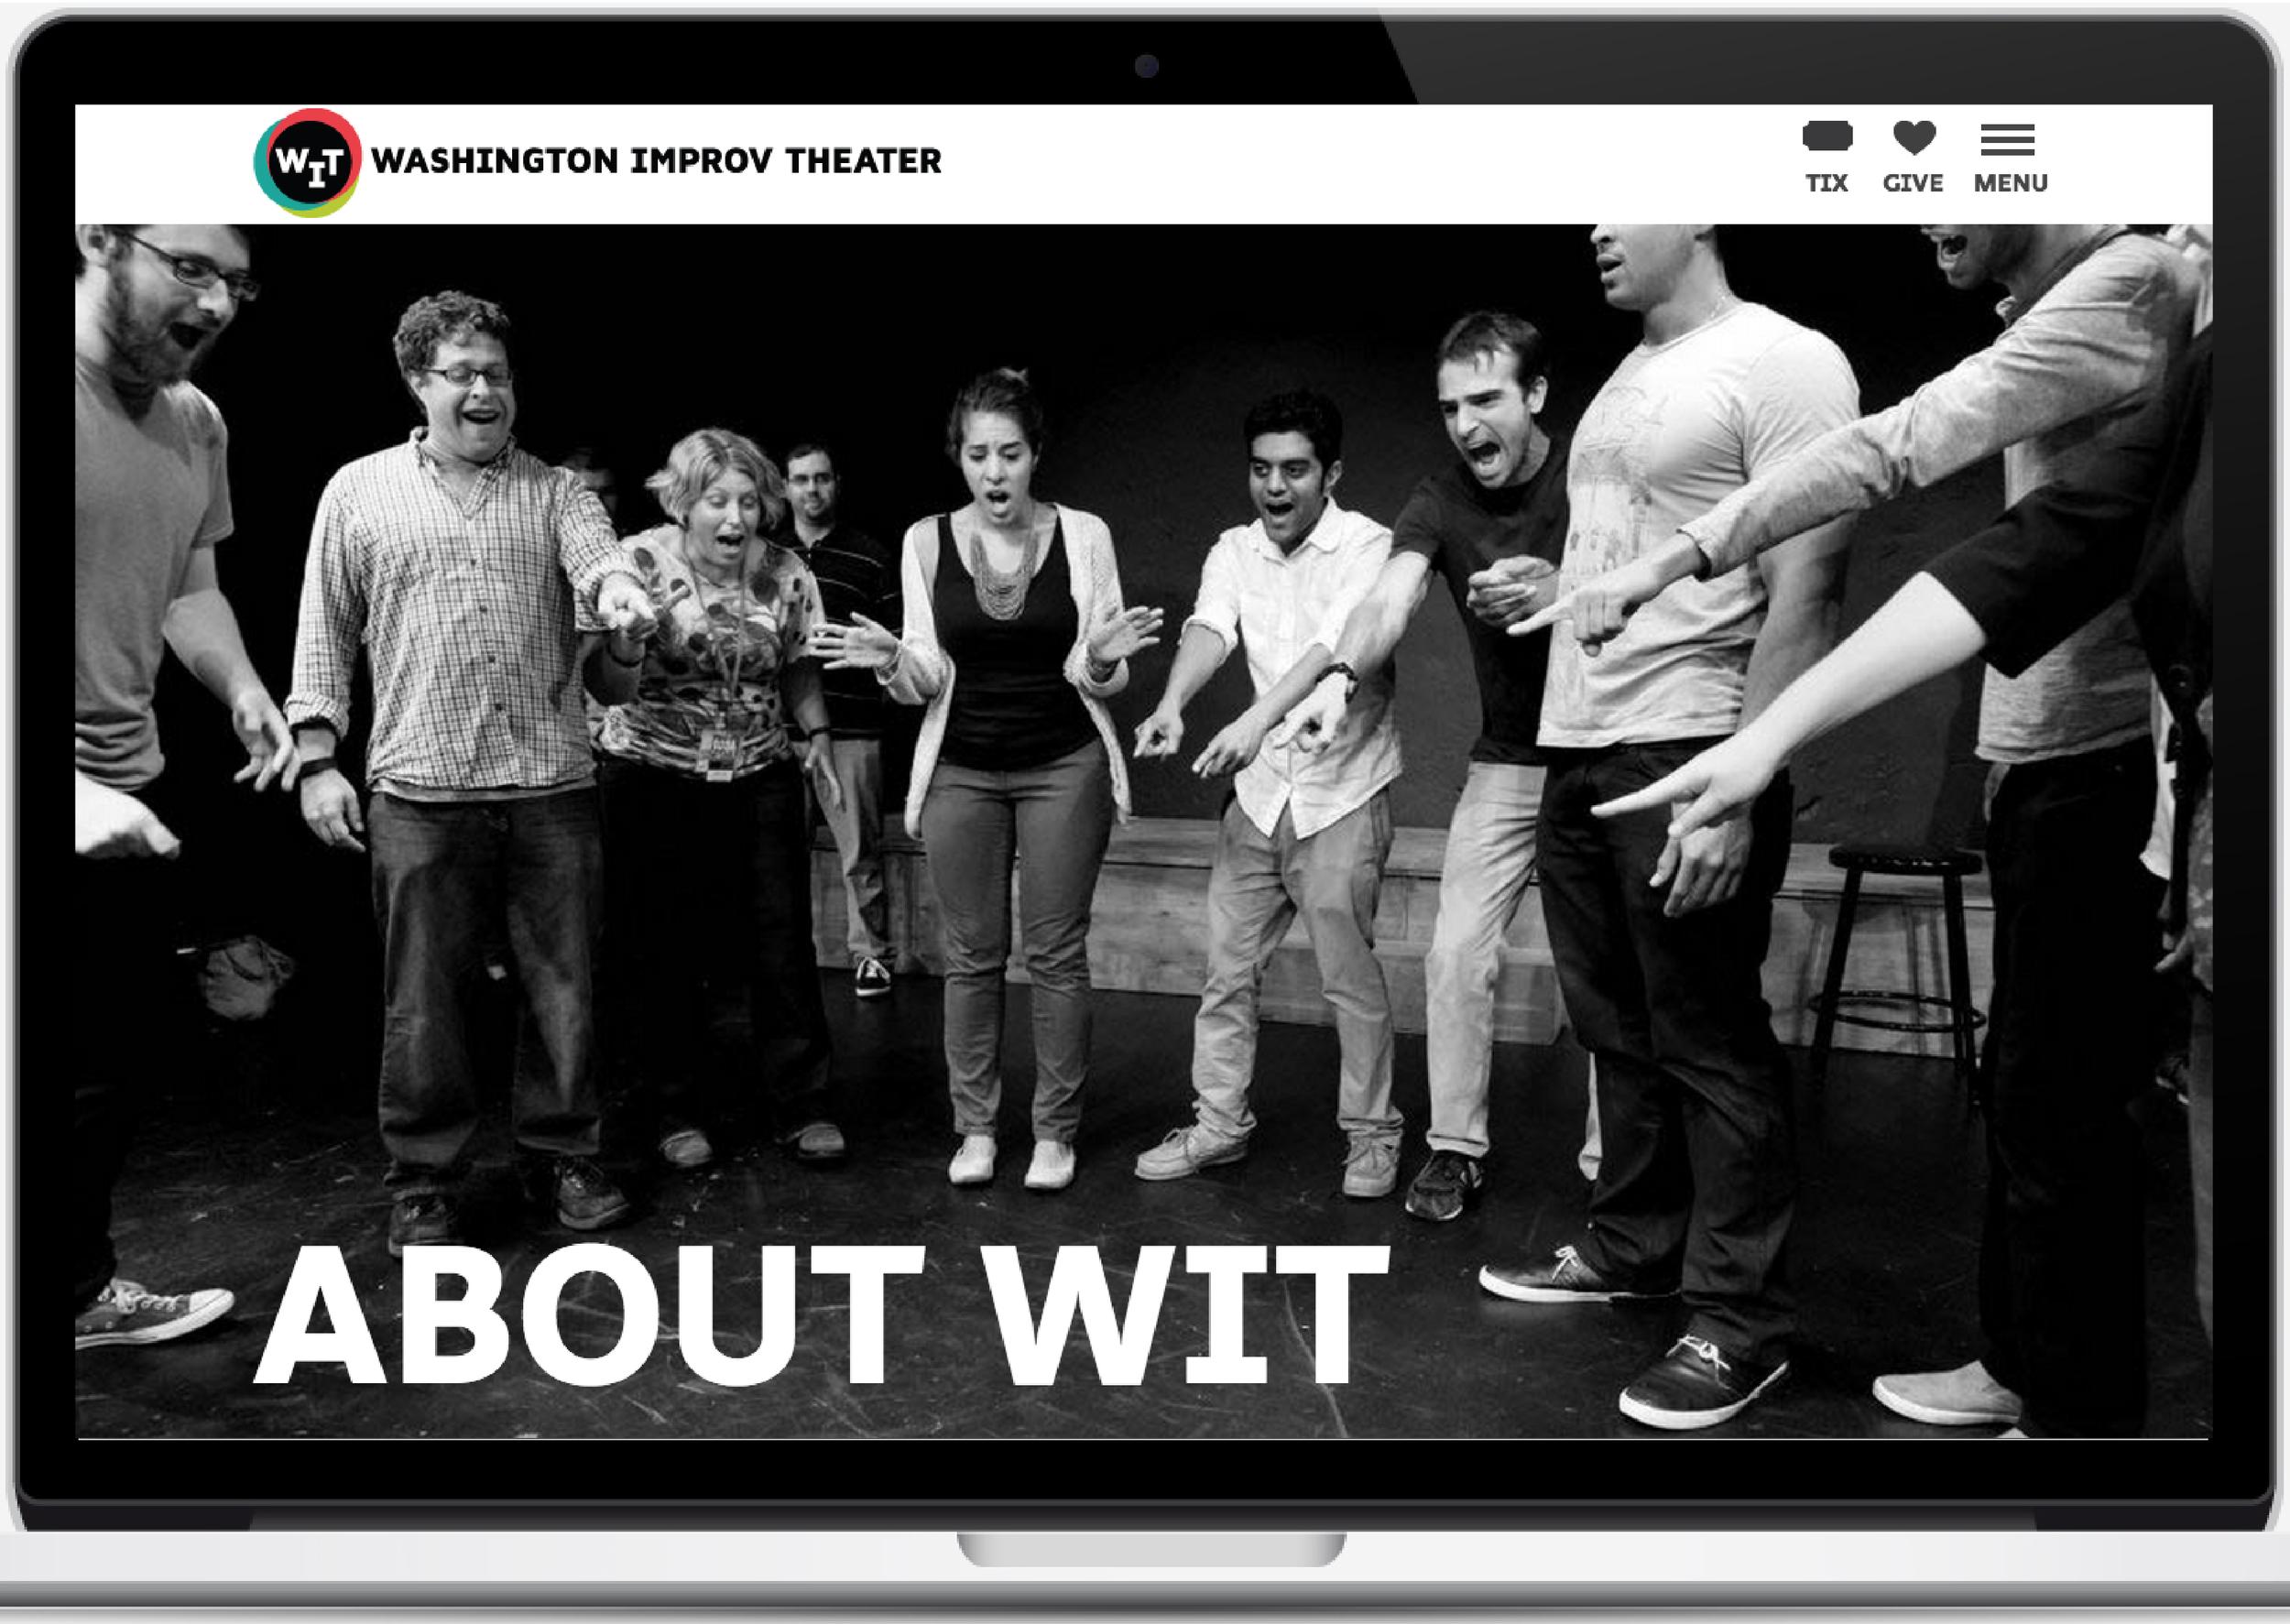 WIT-web_1.jpg